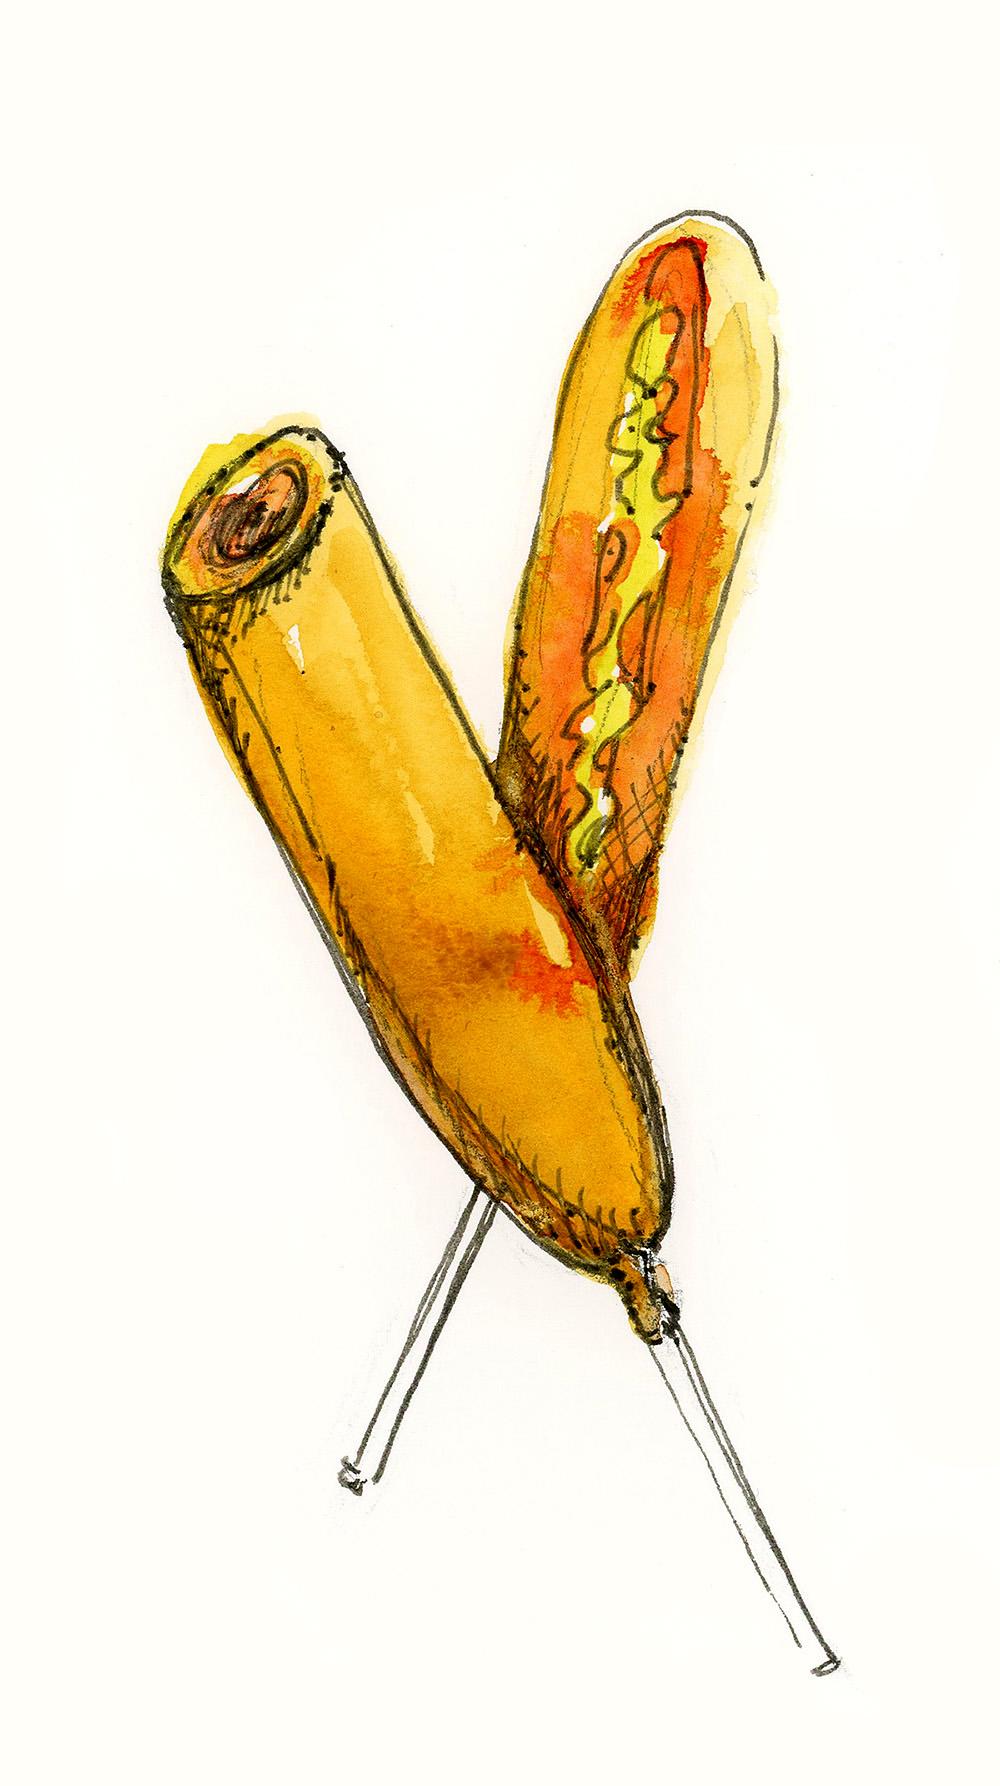 Veggie Corn Dog